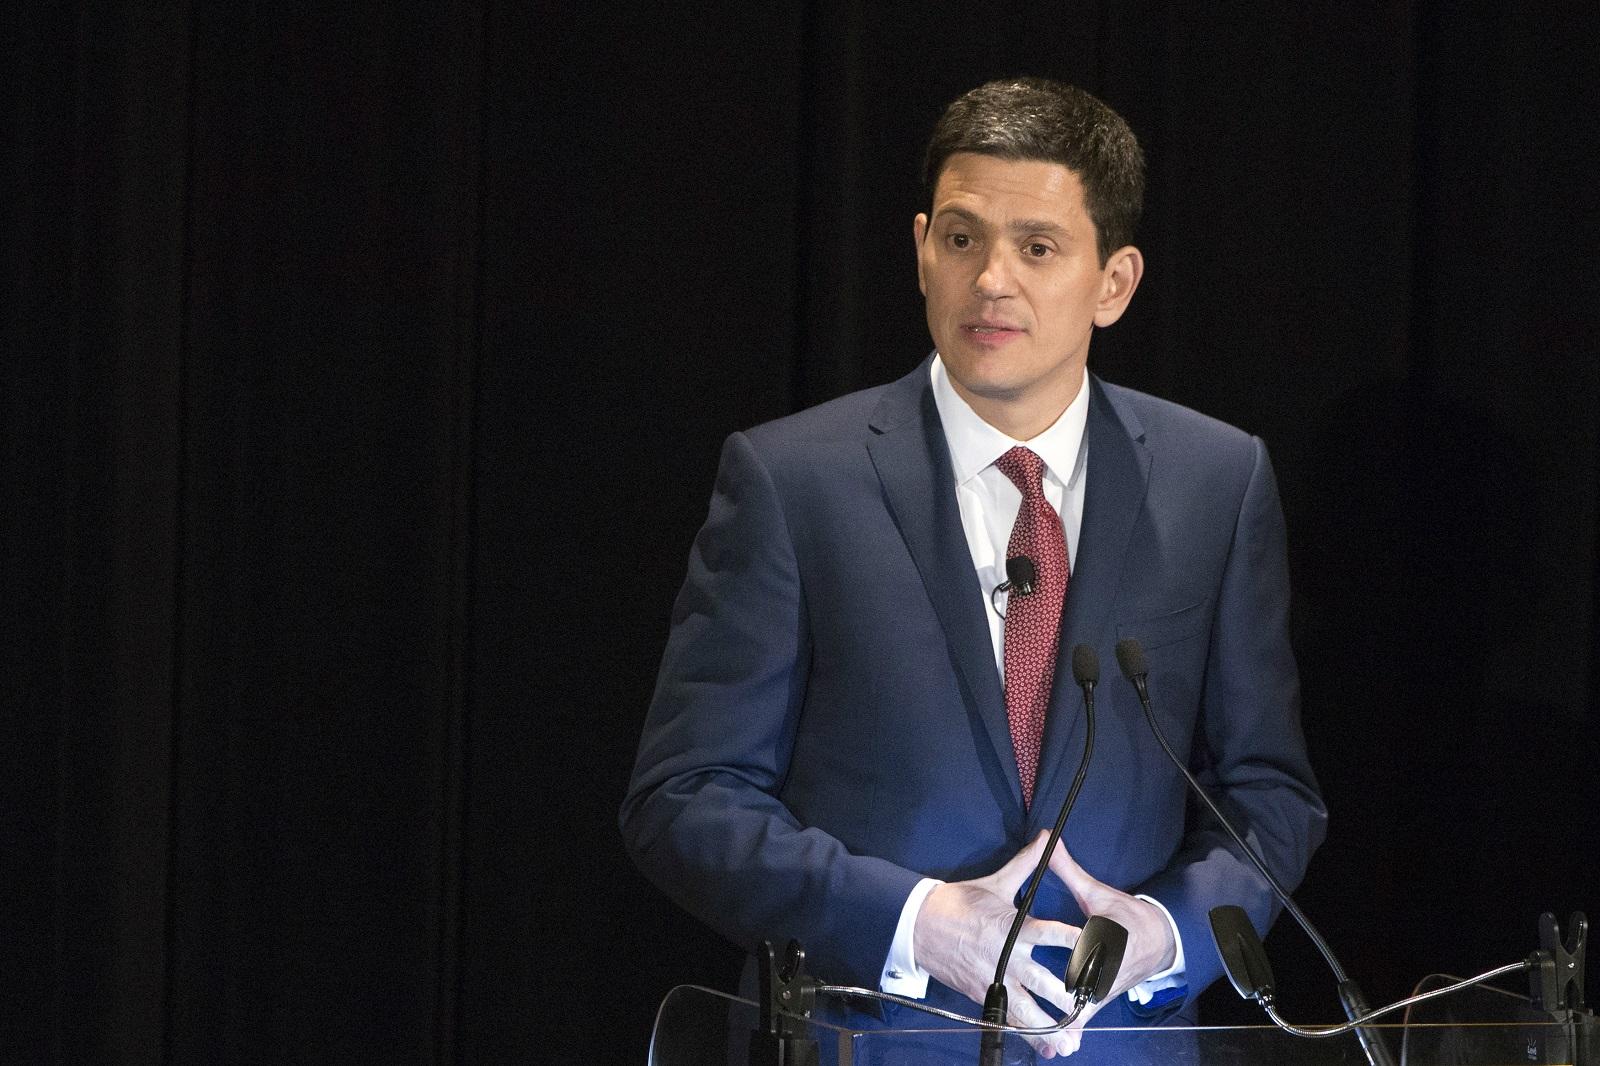 David Miliband to return?